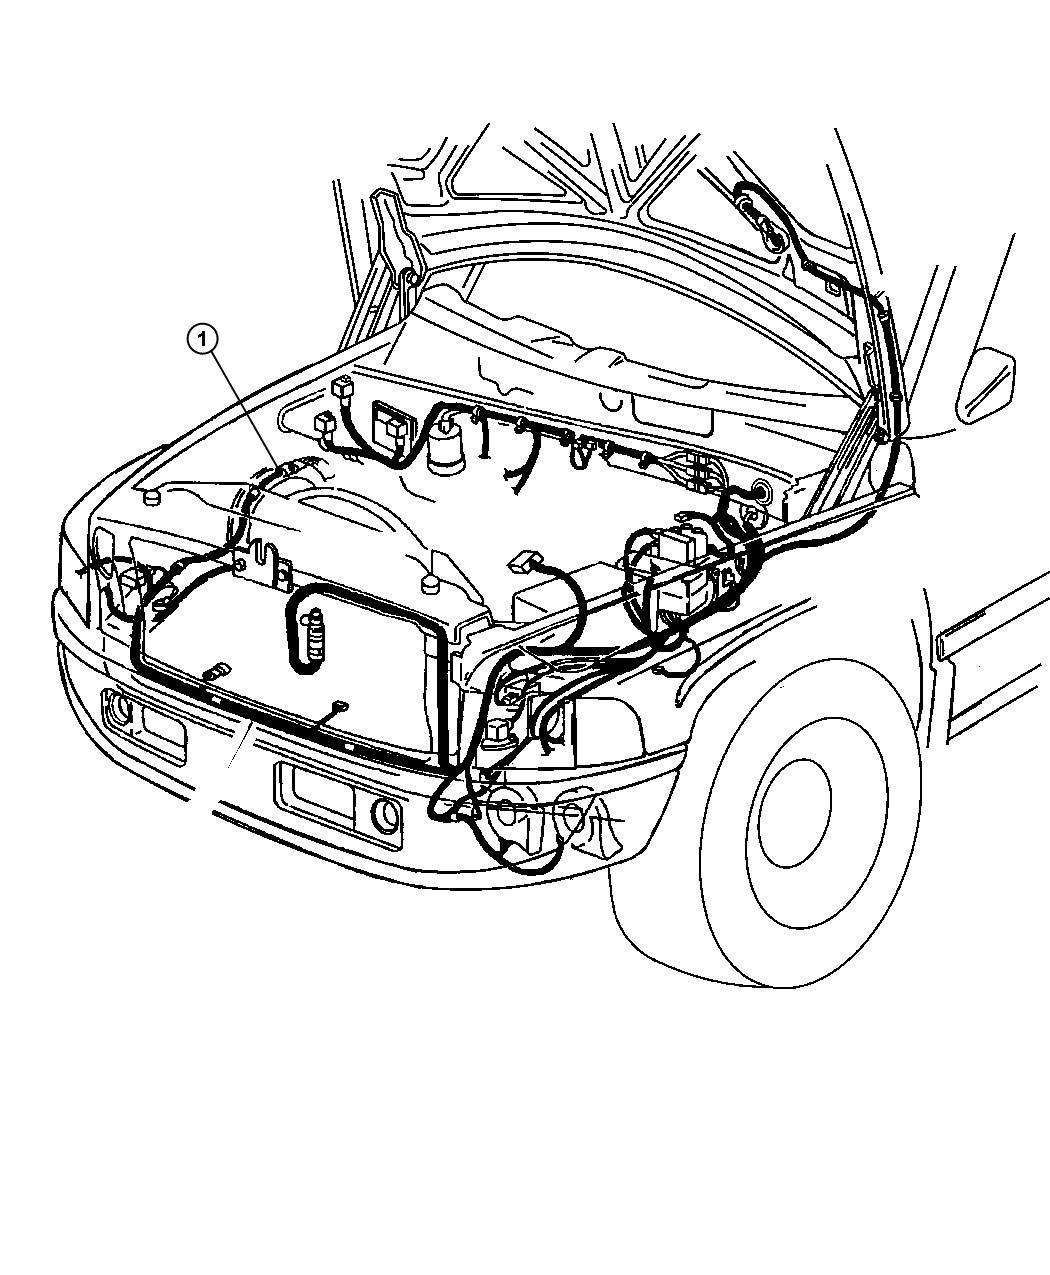 Dodge Dart Plug Wiring Air Vehicles Delete